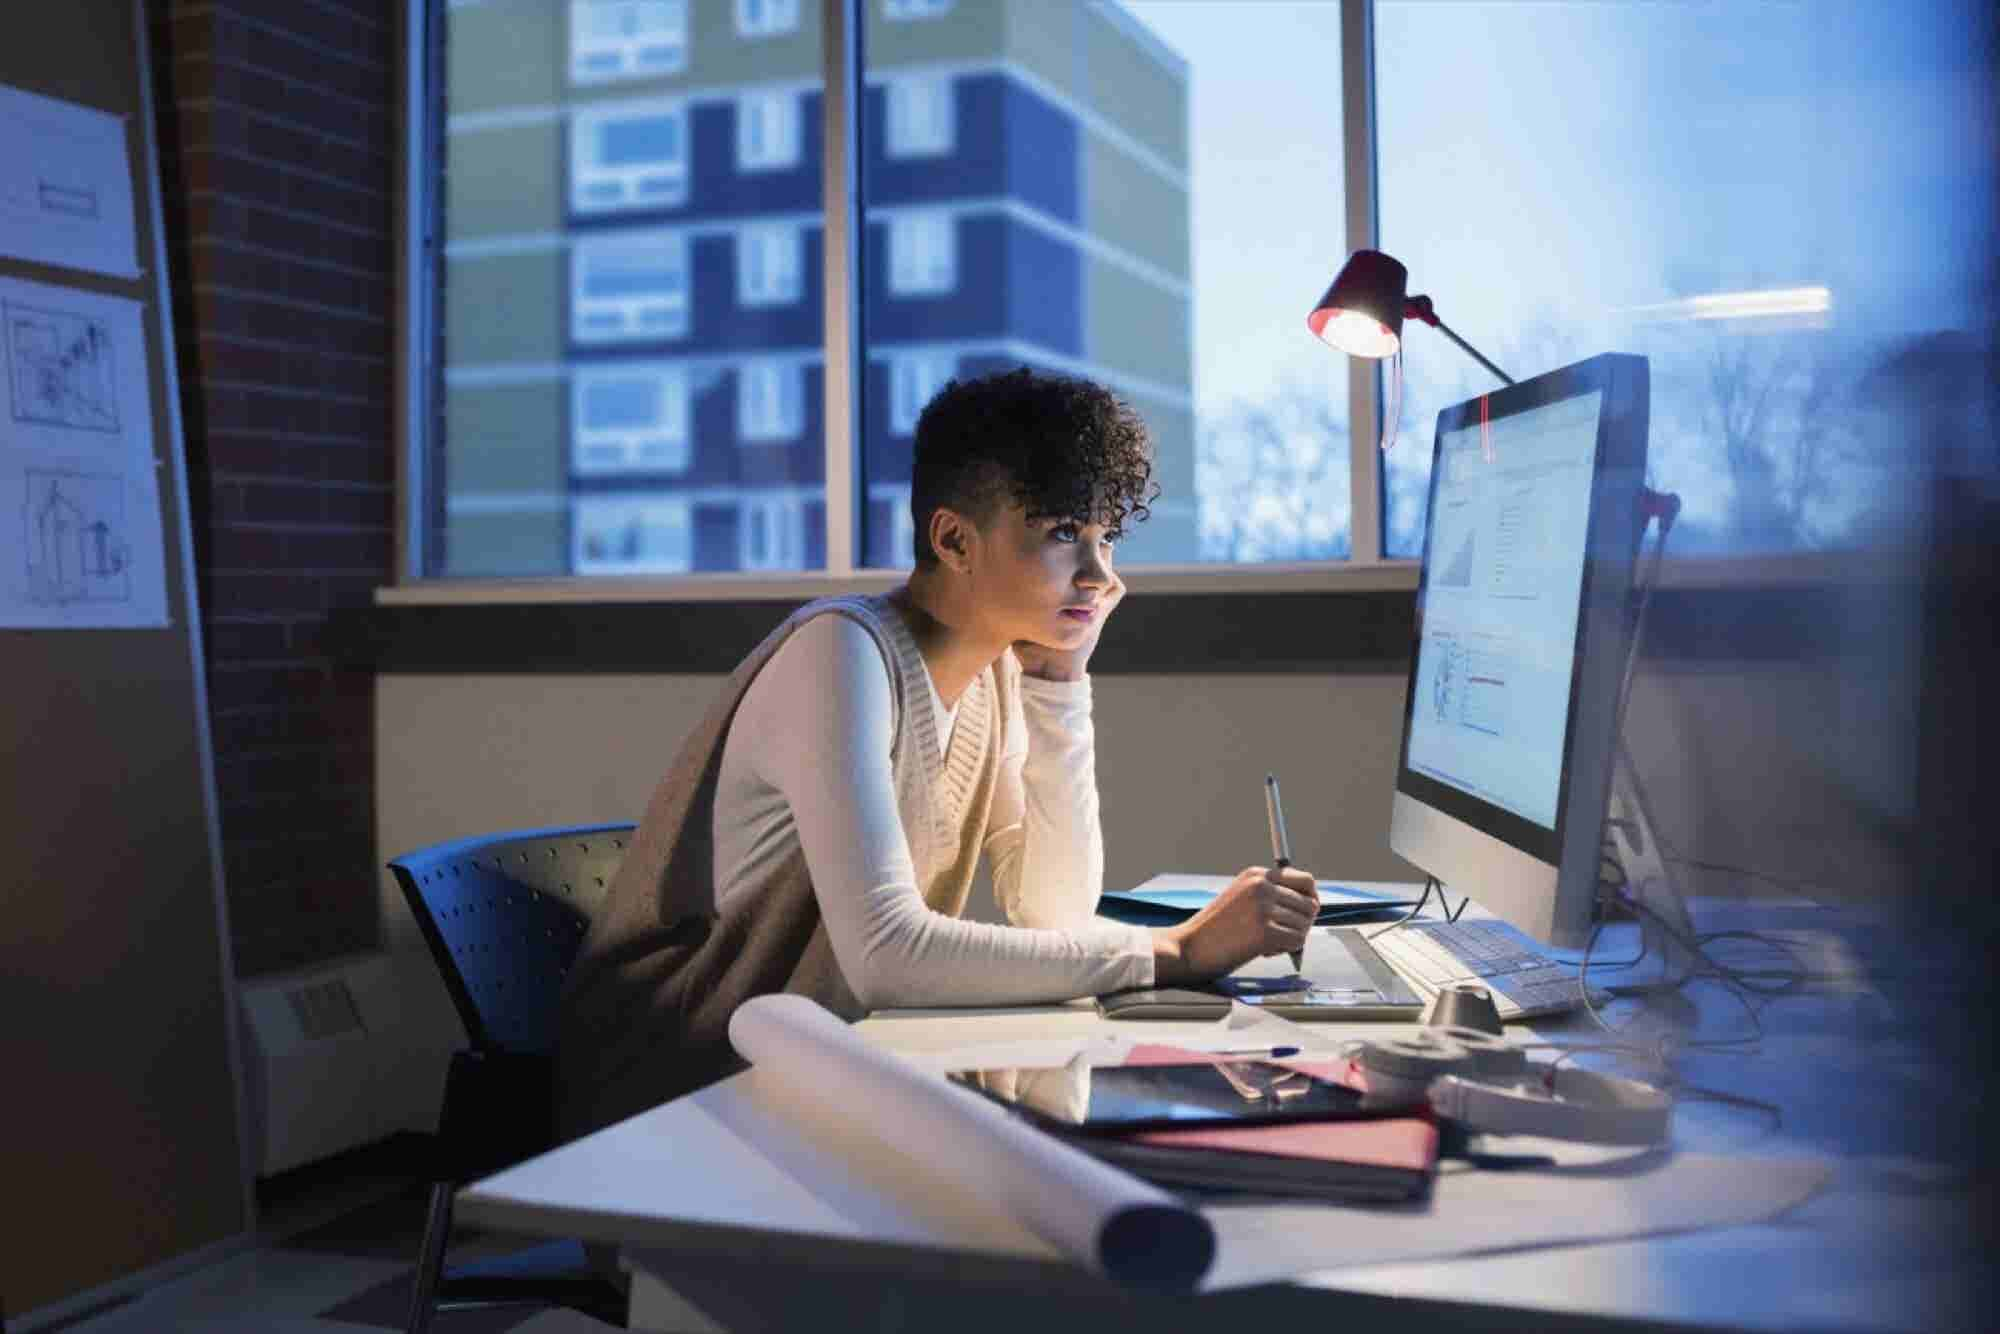 7 Dead-Aim Tactics for Meeting Deadlines